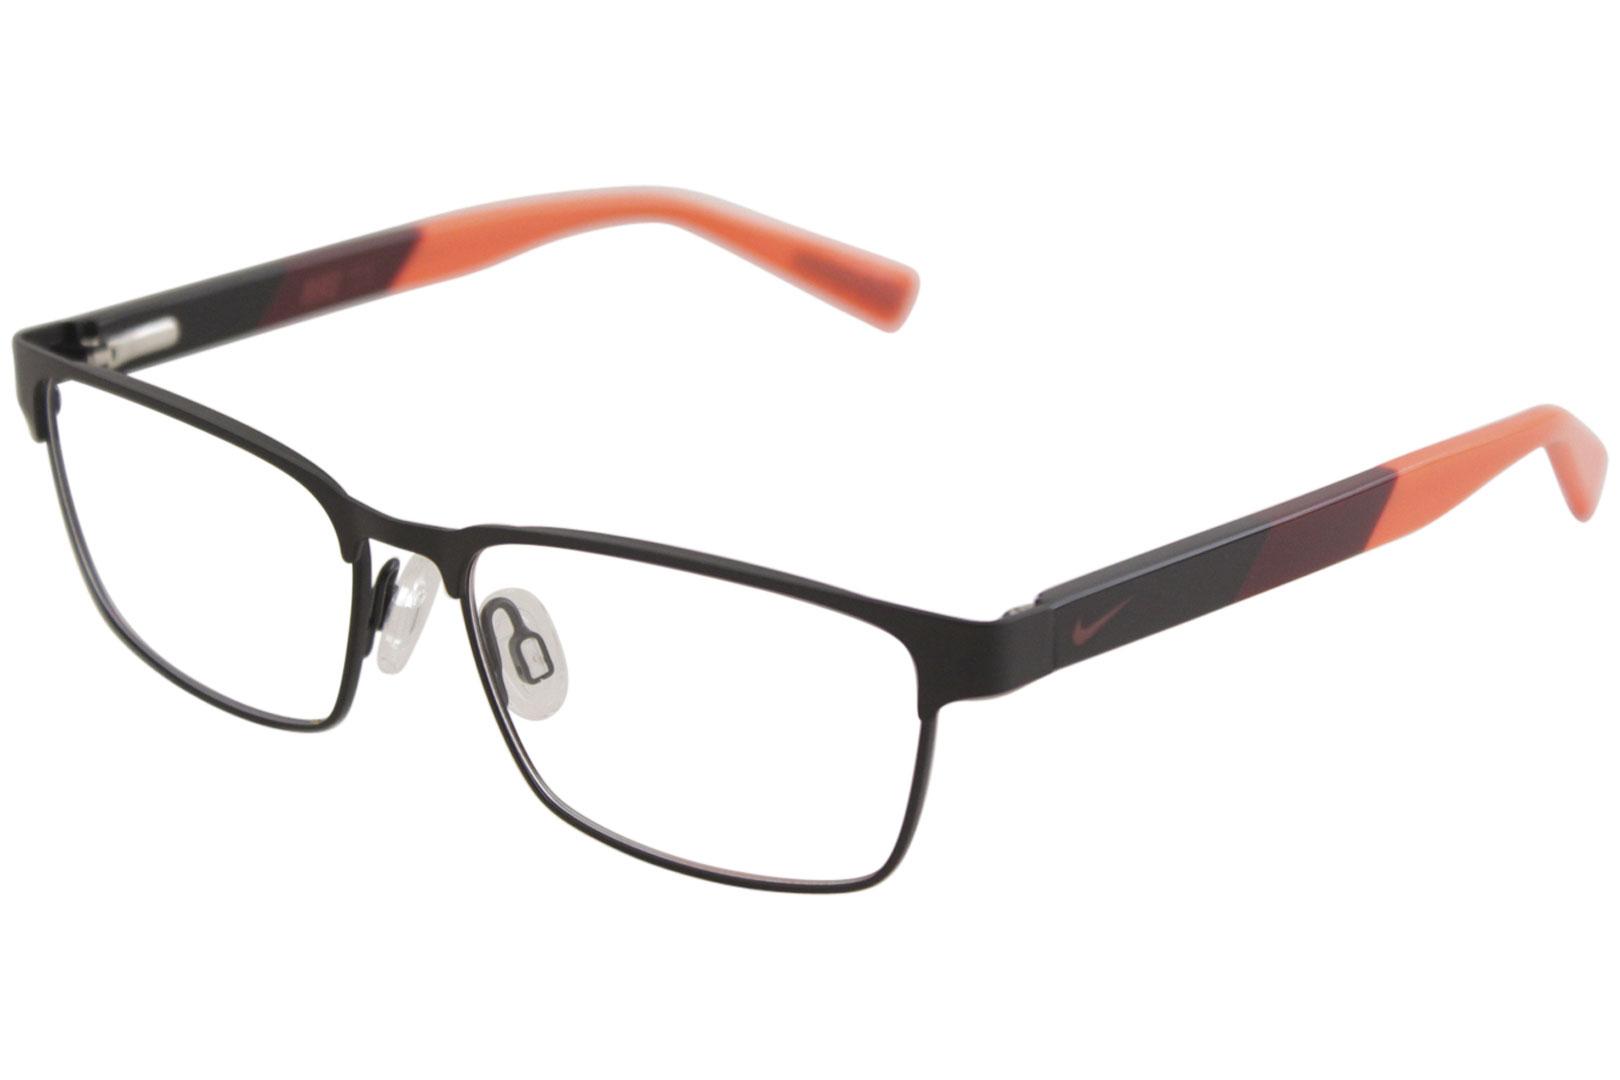 194e8ec77981 Nike Youth Boy's Eyeglasses 5575 001 Satin Black/Team Red Optical ...